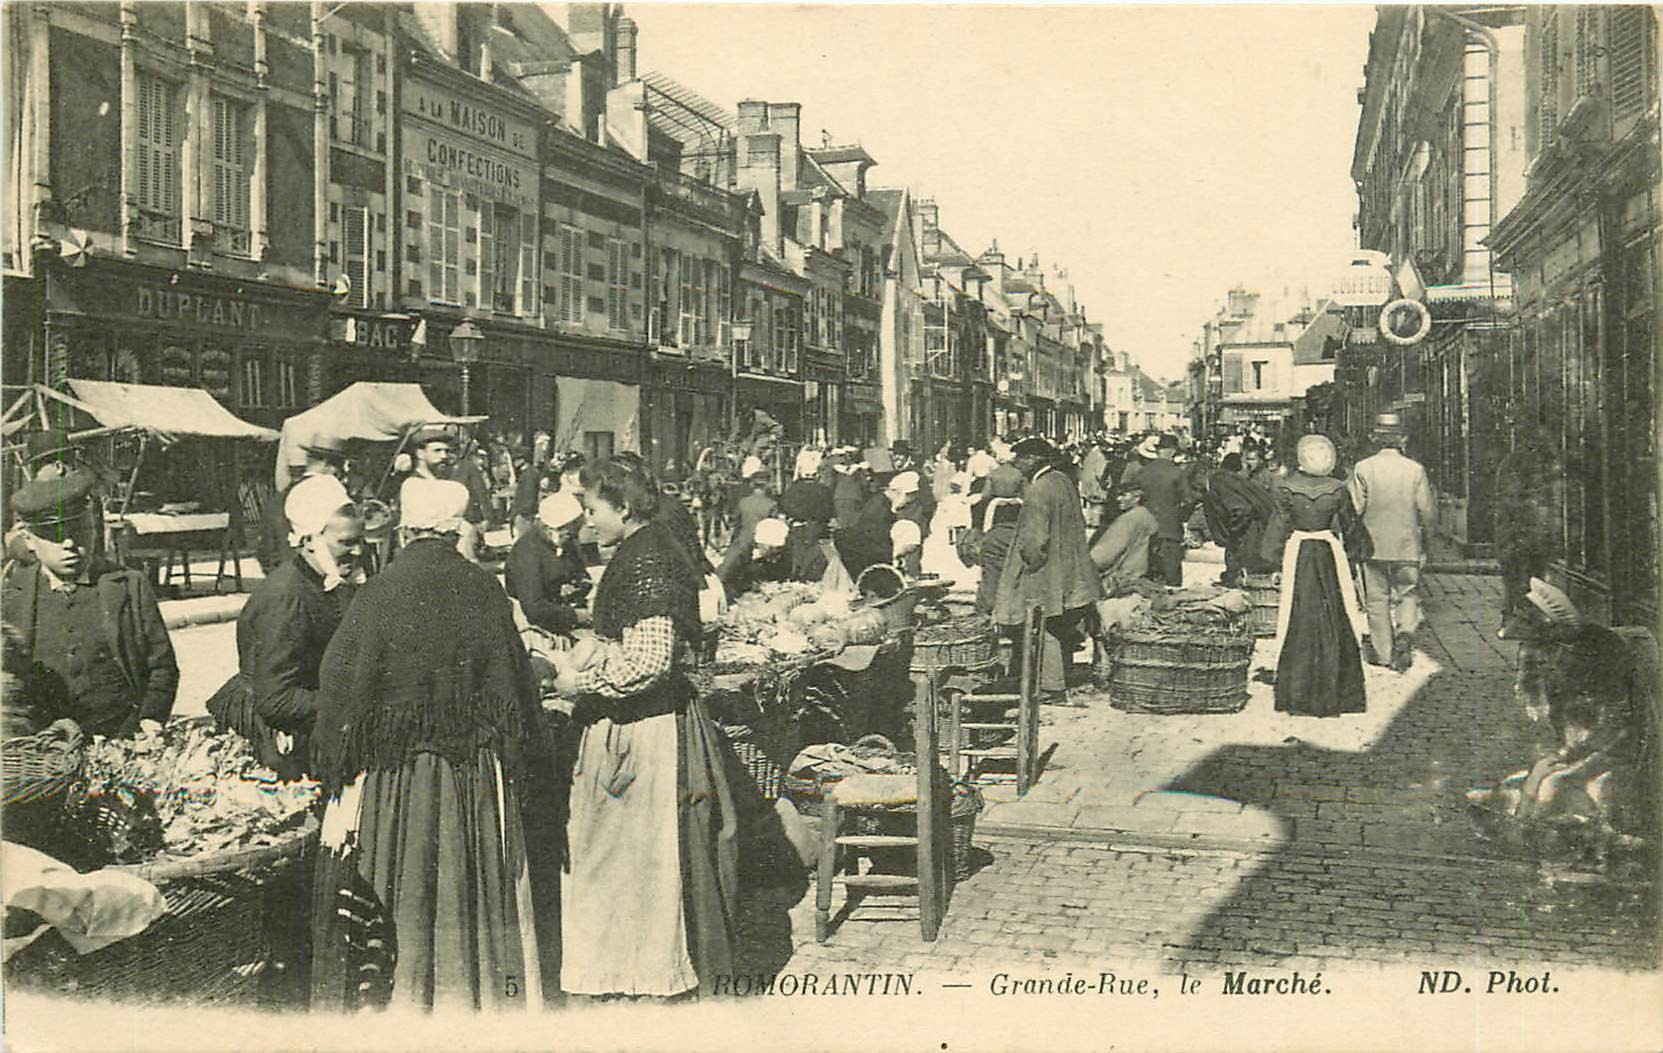 WW 41 ROMORANTIN. Le Marché sur Grande Rue 1916